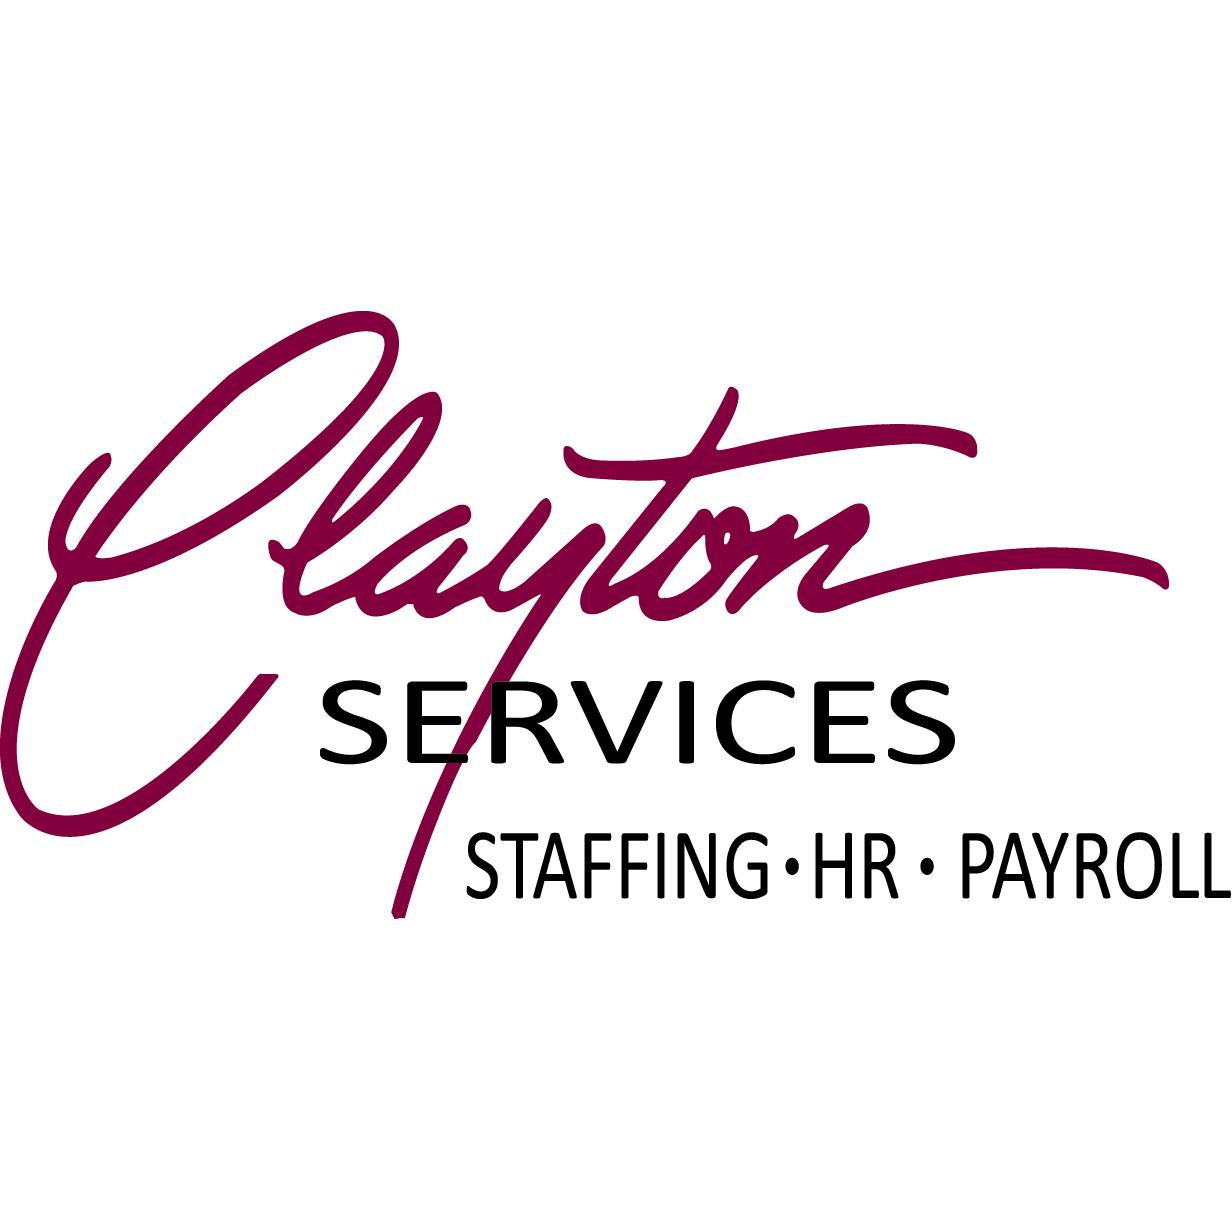 Clayton Services - Houston, TX 77040 - (713)937-3020 | ShowMeLocal.com